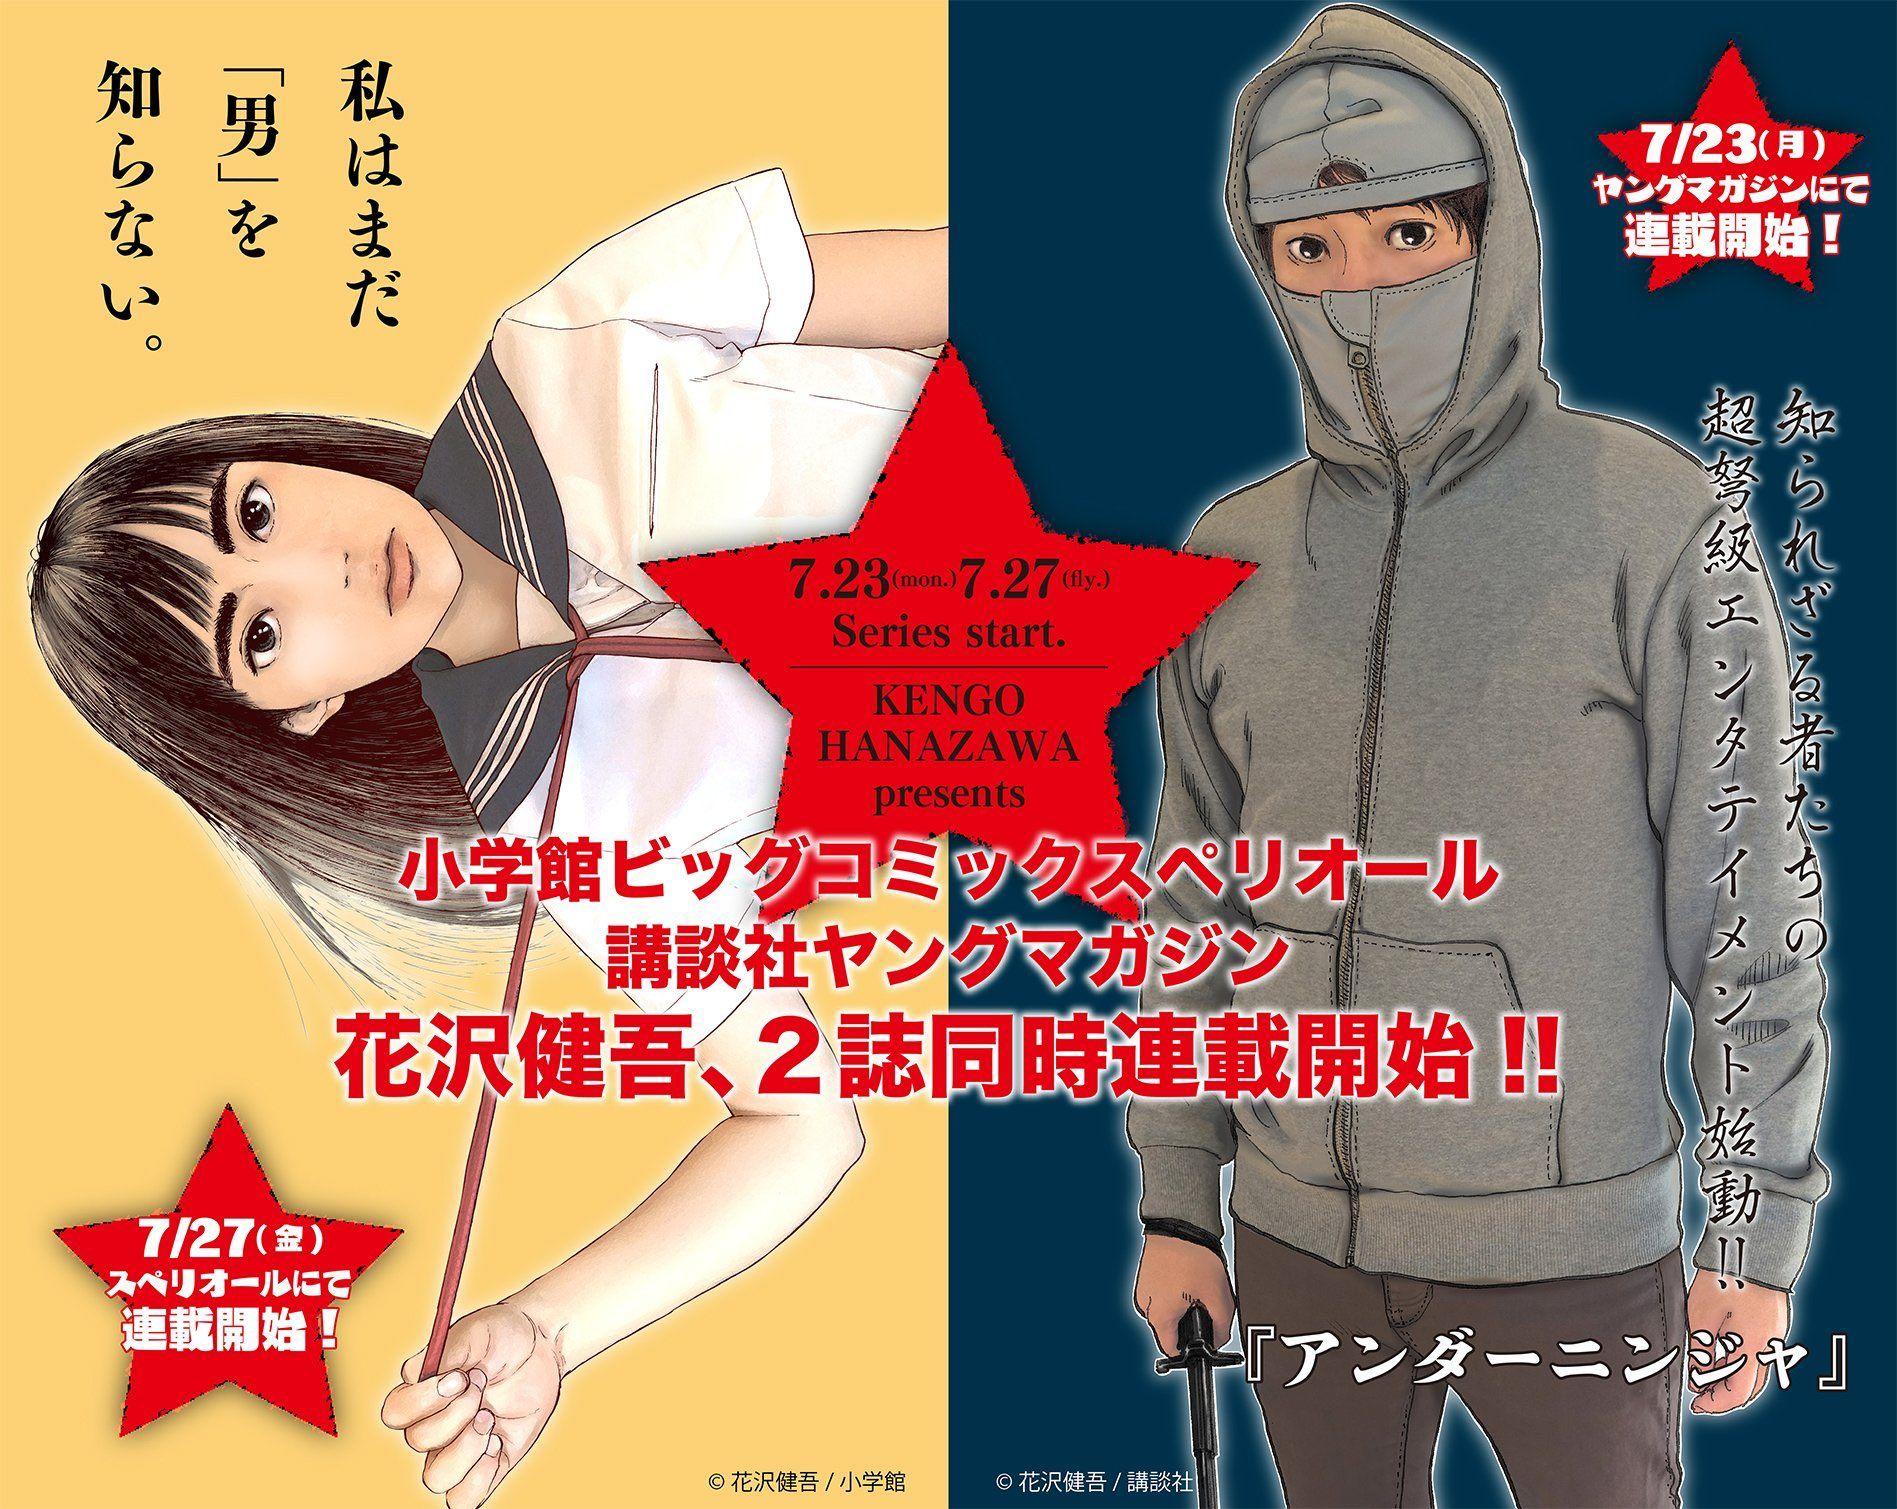 kengo-hanazawa-double-seriex.jpg